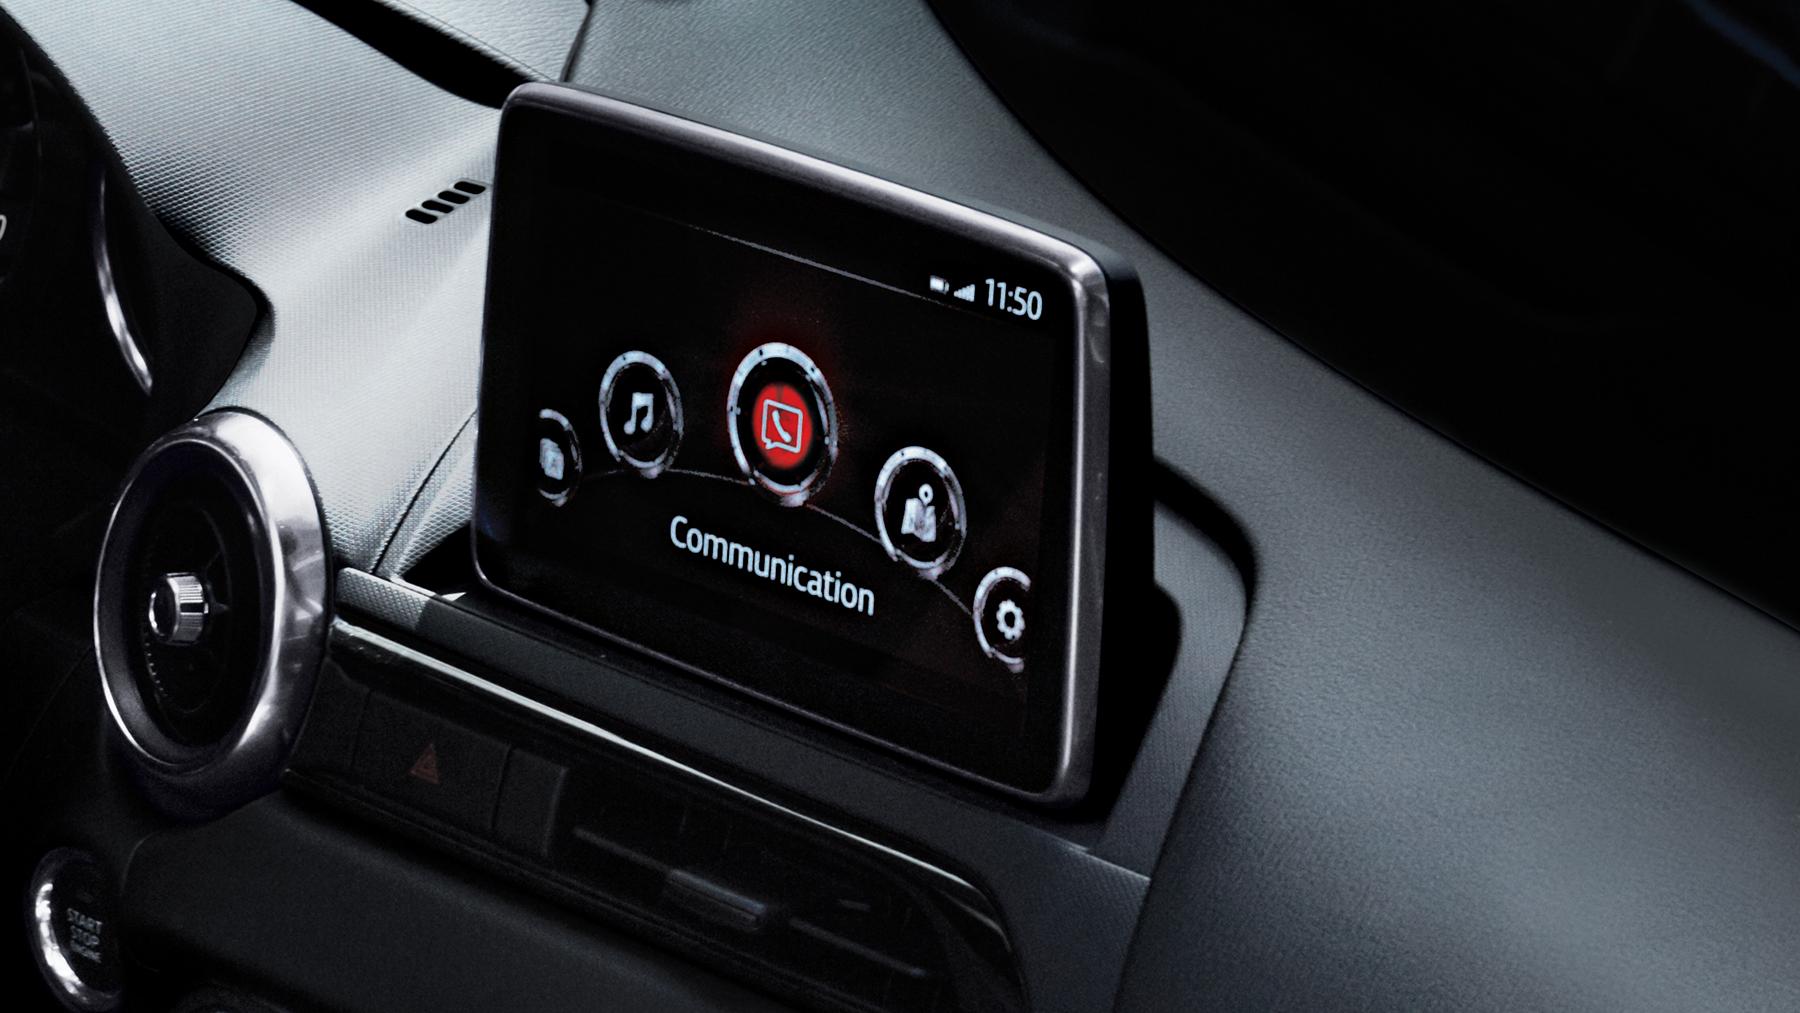 2019 Mazda MX-5 Miata RF Roadster - Pictures & Videos ...